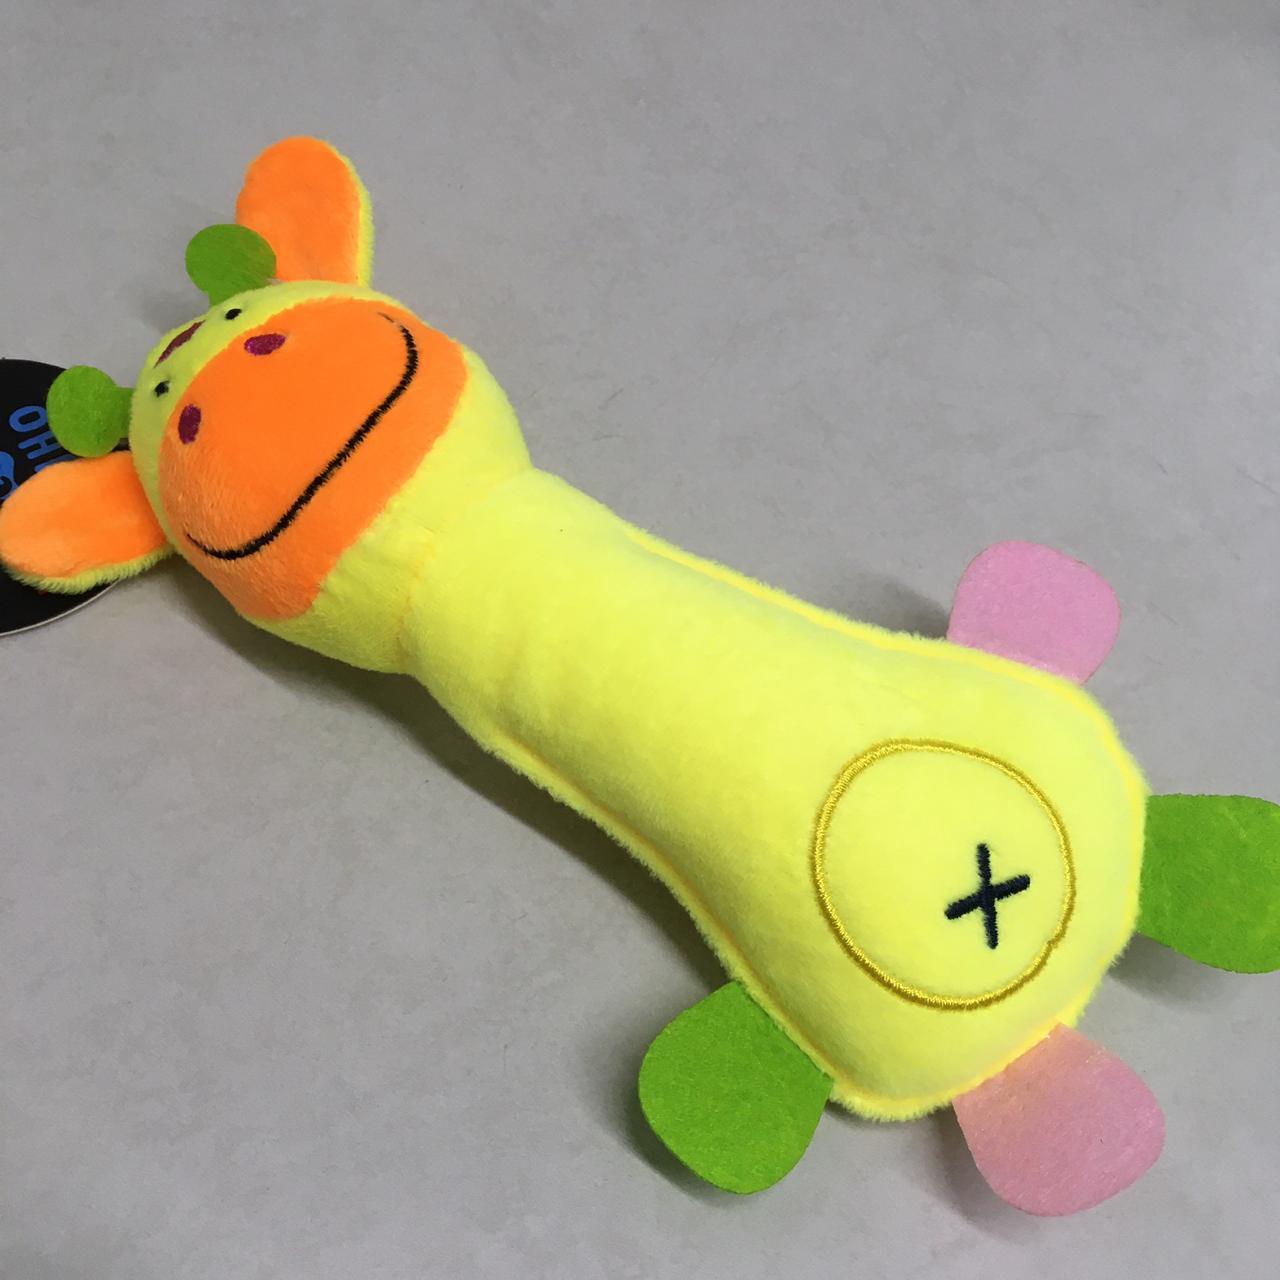 Brinquedo Pelúcia Animal Divertido para Cães e Gatos apito sonoro